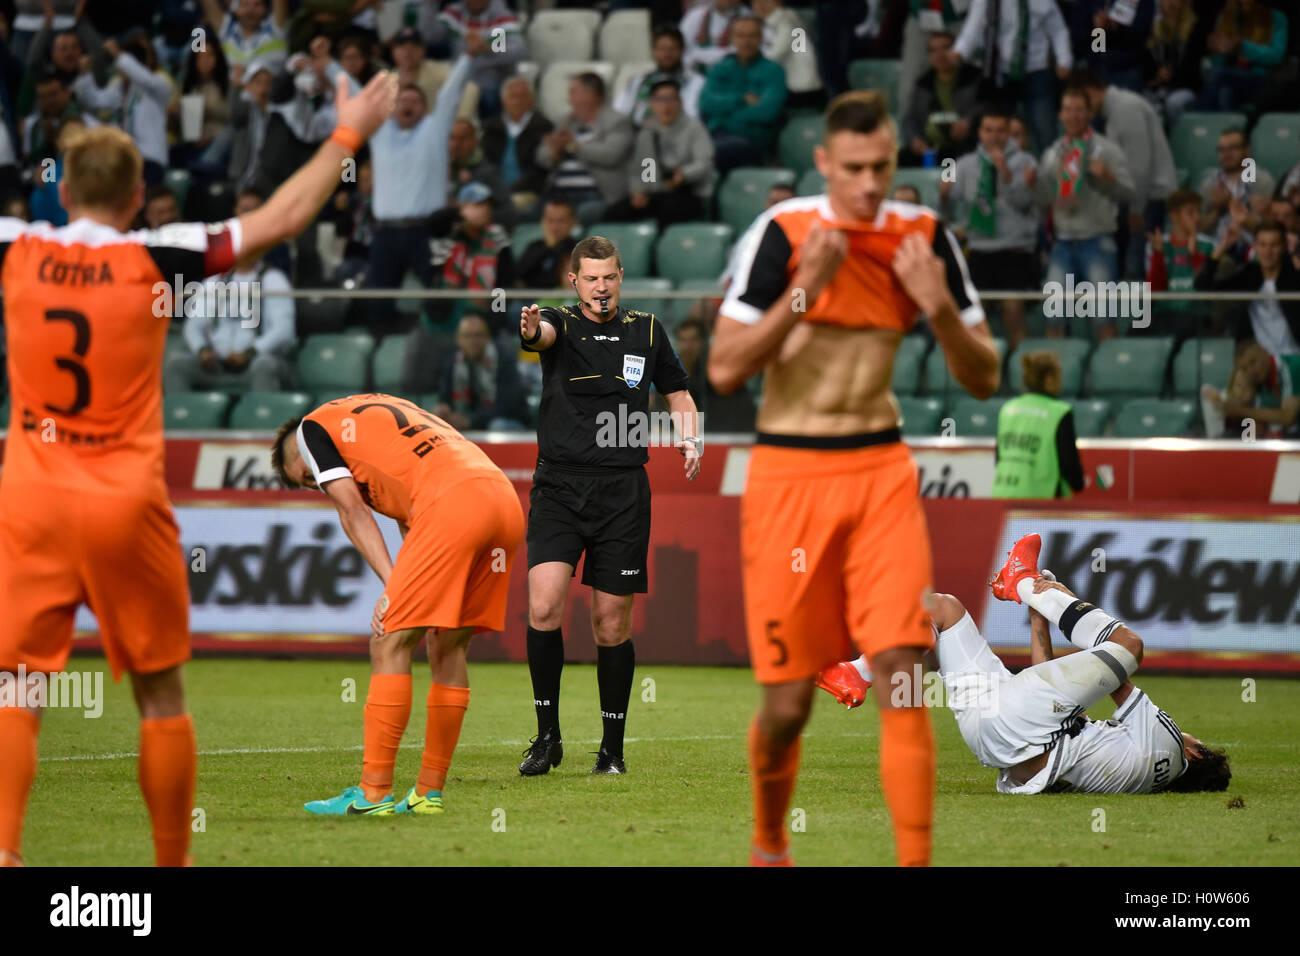 WARSAW, POLAND - SEPTEMBER 18, 2016: Match Polish PremIer League Lotto Ekstraklasa between Legia Warszawa - KGHM - Stock Image